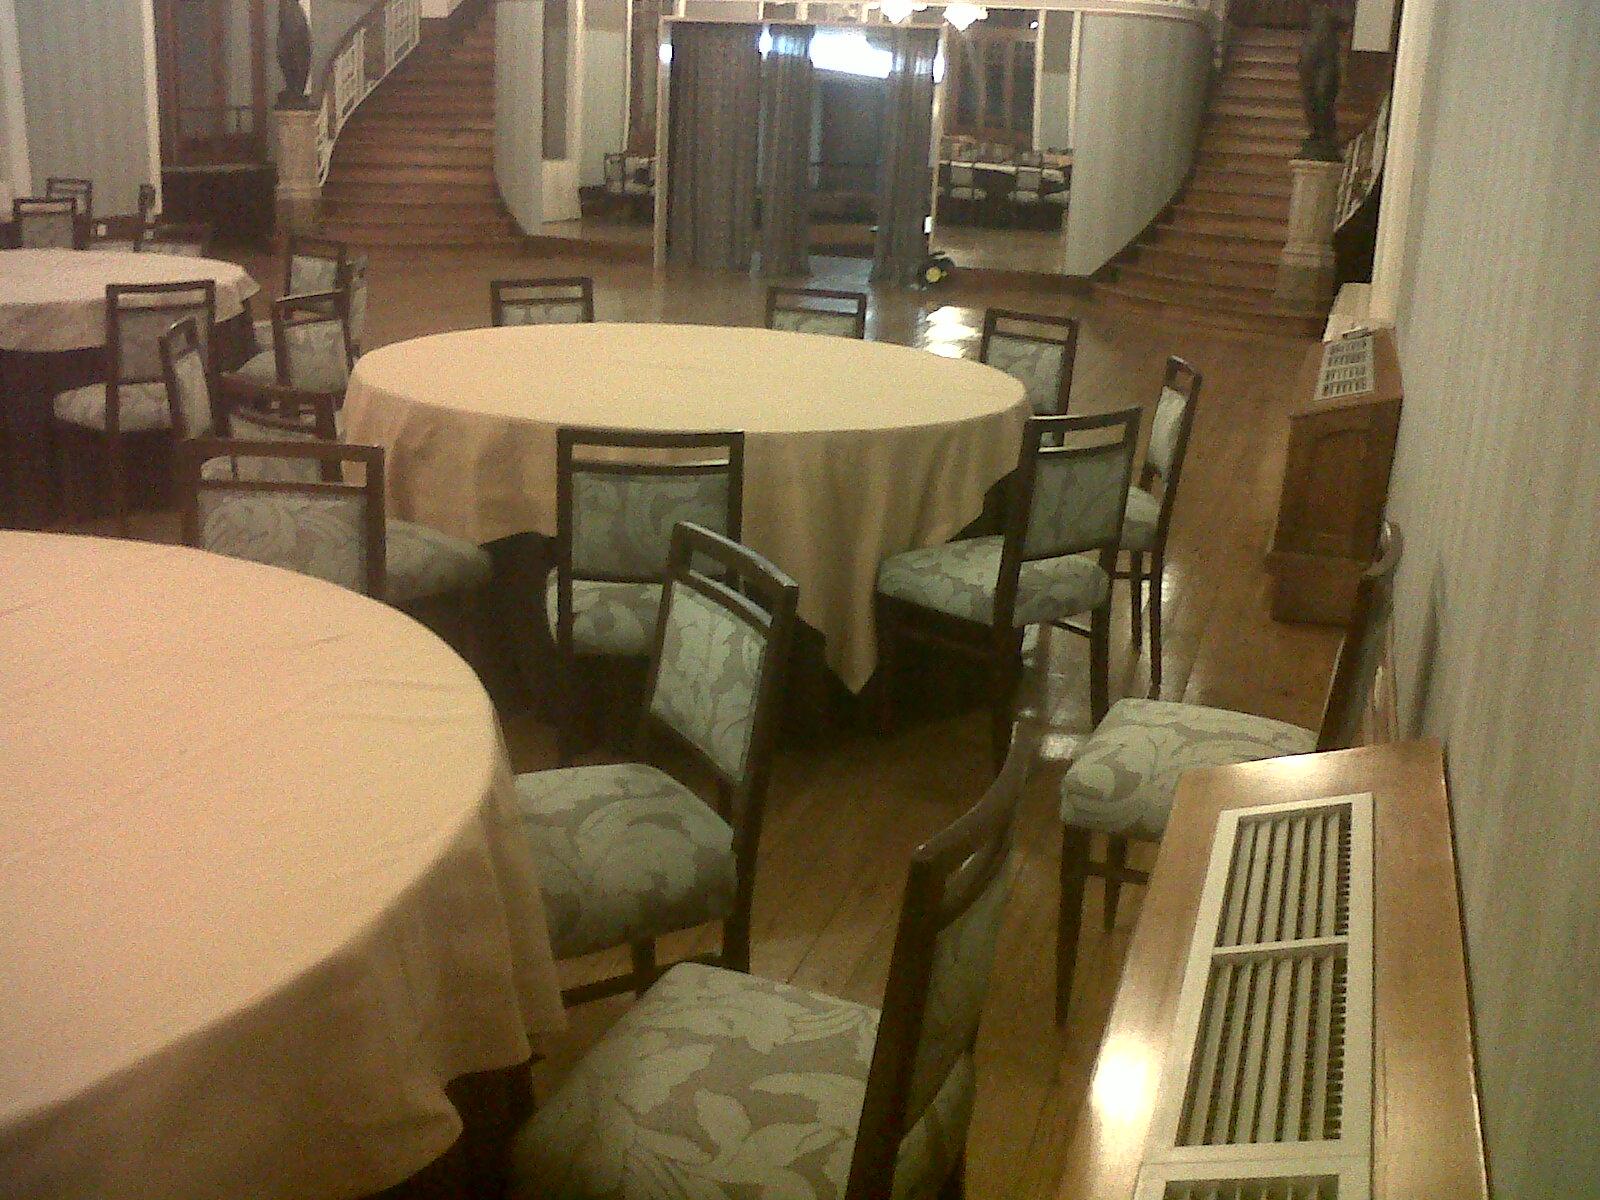 curia-palacio-curia-hotel-restaurant-dec12